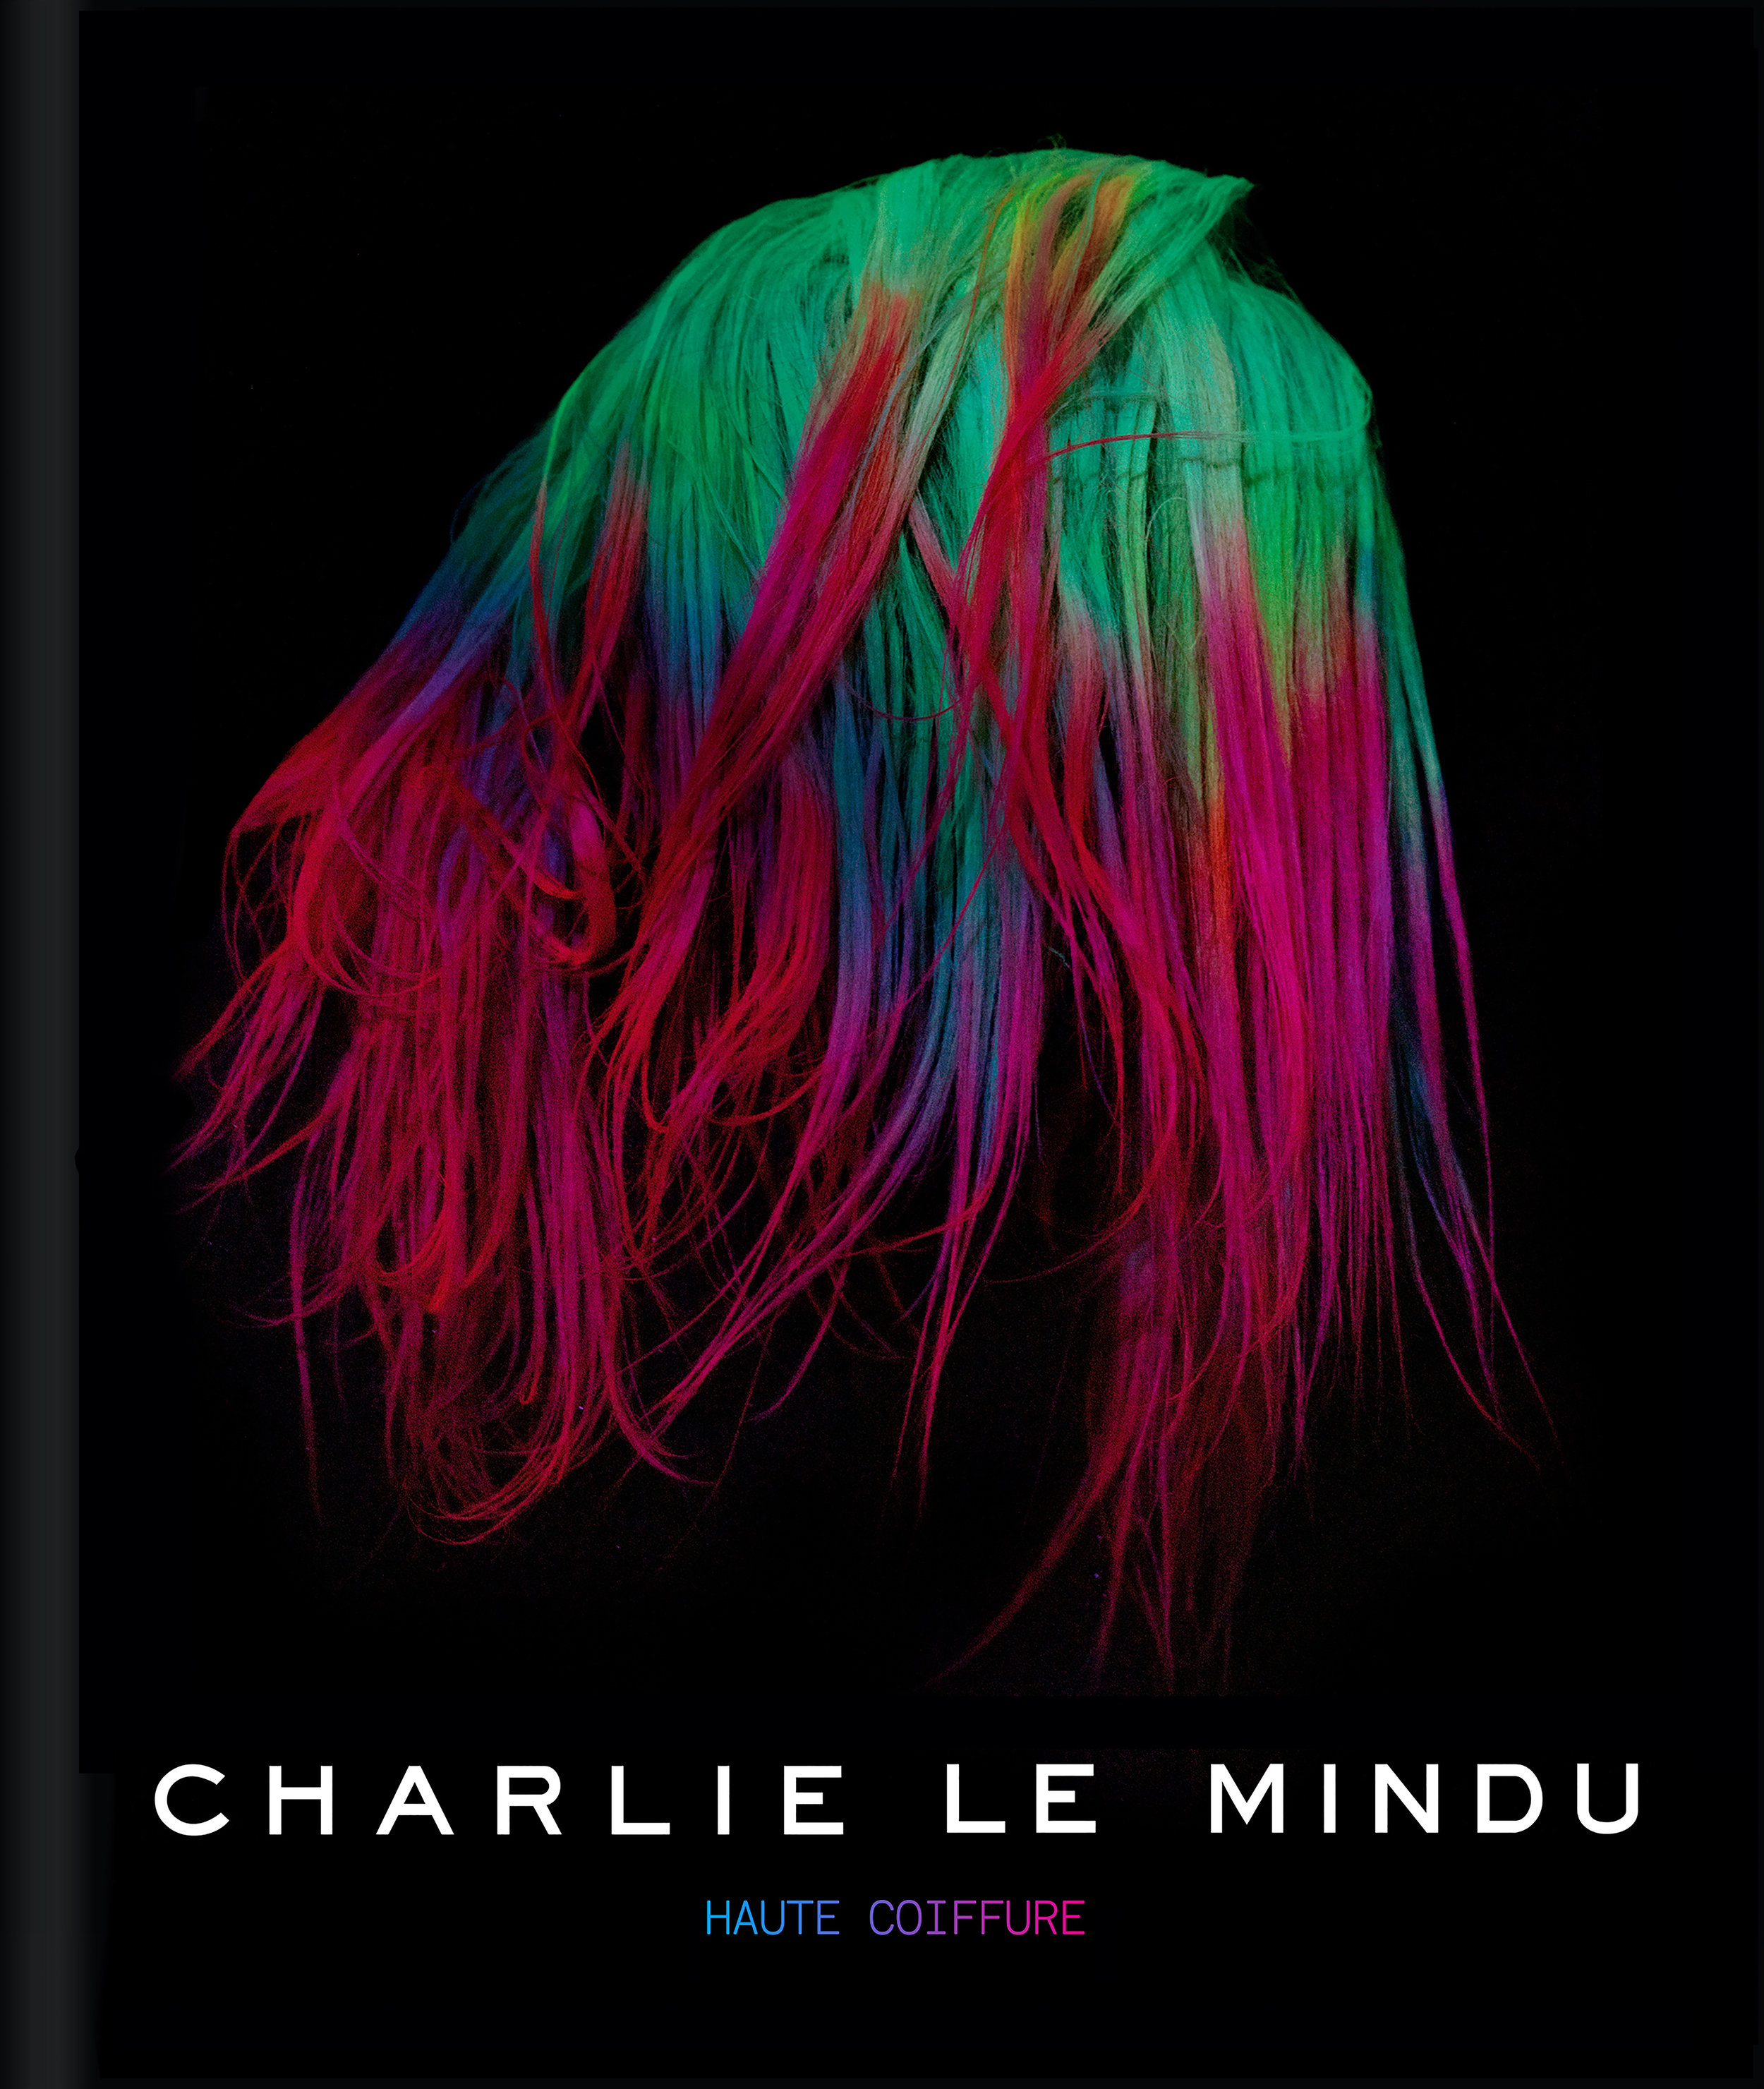 9781909399648 Charlie Le Mindu Haute Coiffure final cover.jpg